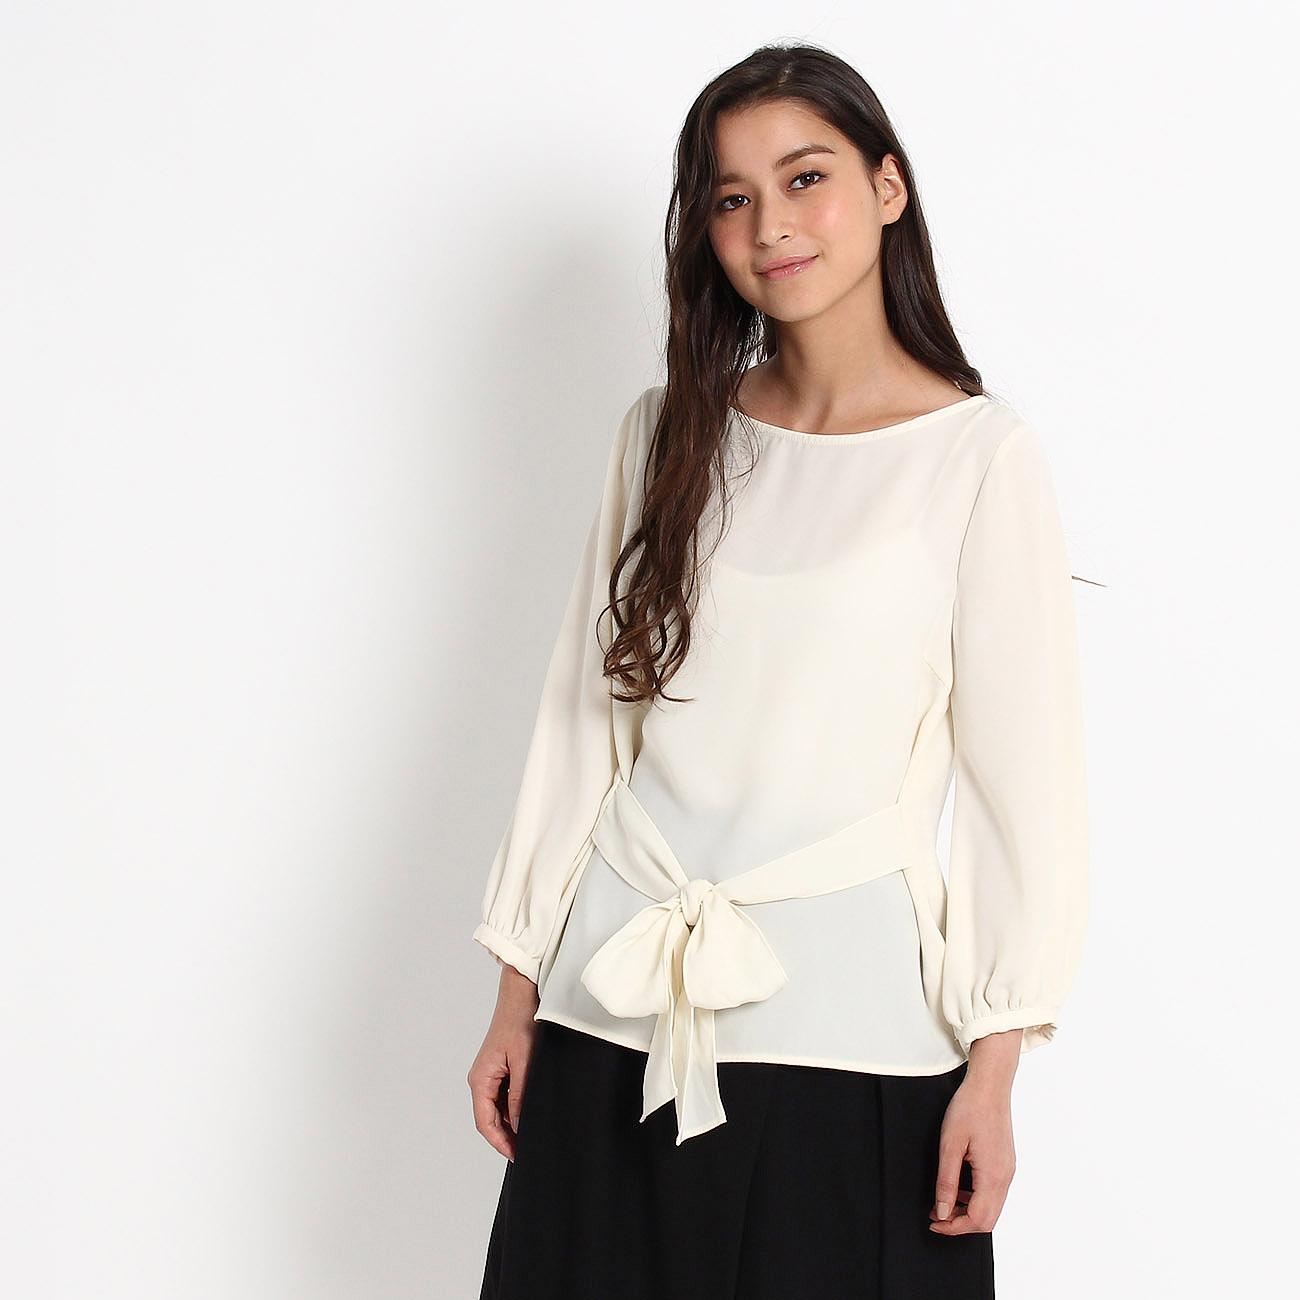 【Couture brooch (クチュールブローチ)】フロントリボンブラウスレディース トップス|シャツ・ブラウス オフホワイト